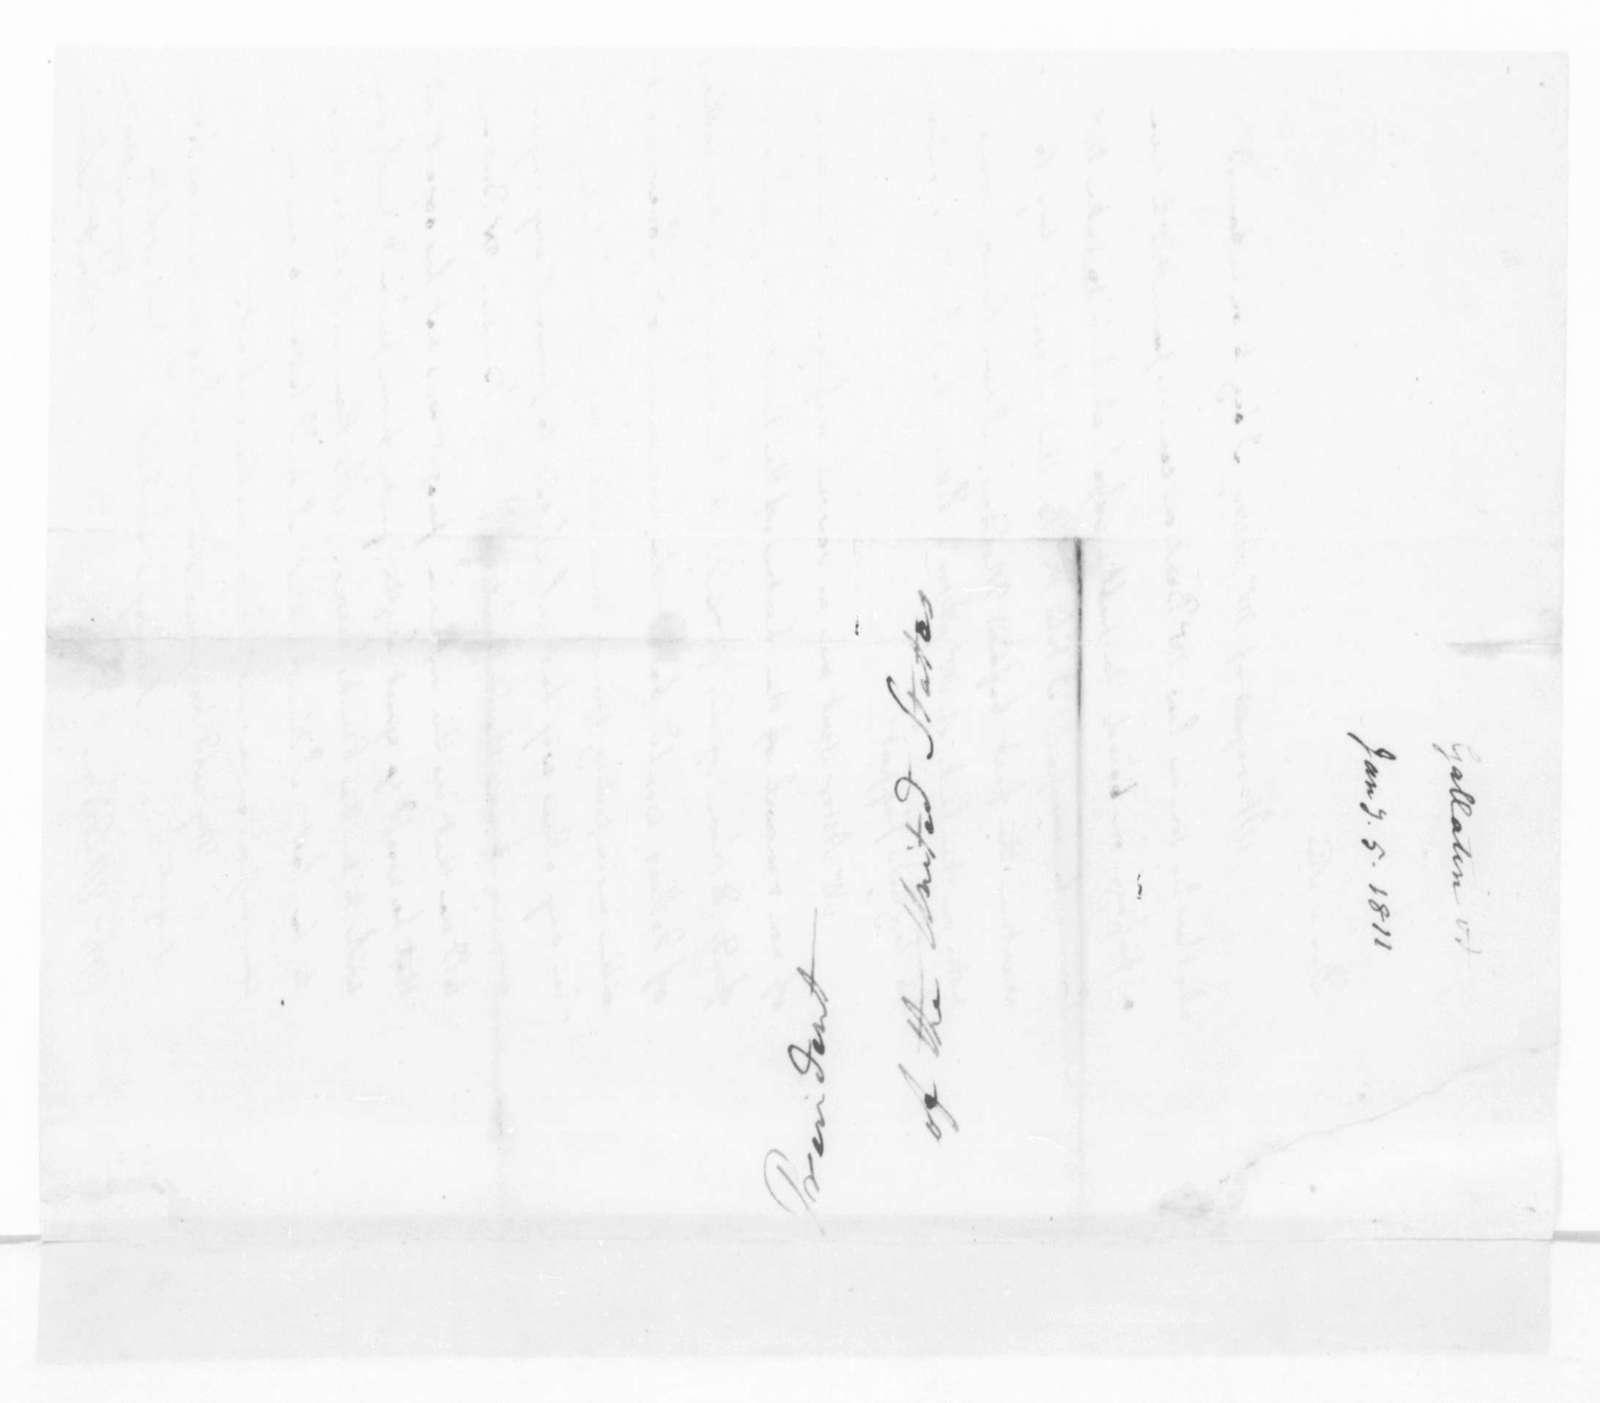 Albert Gallatin to James Madison, January 5, 1811.